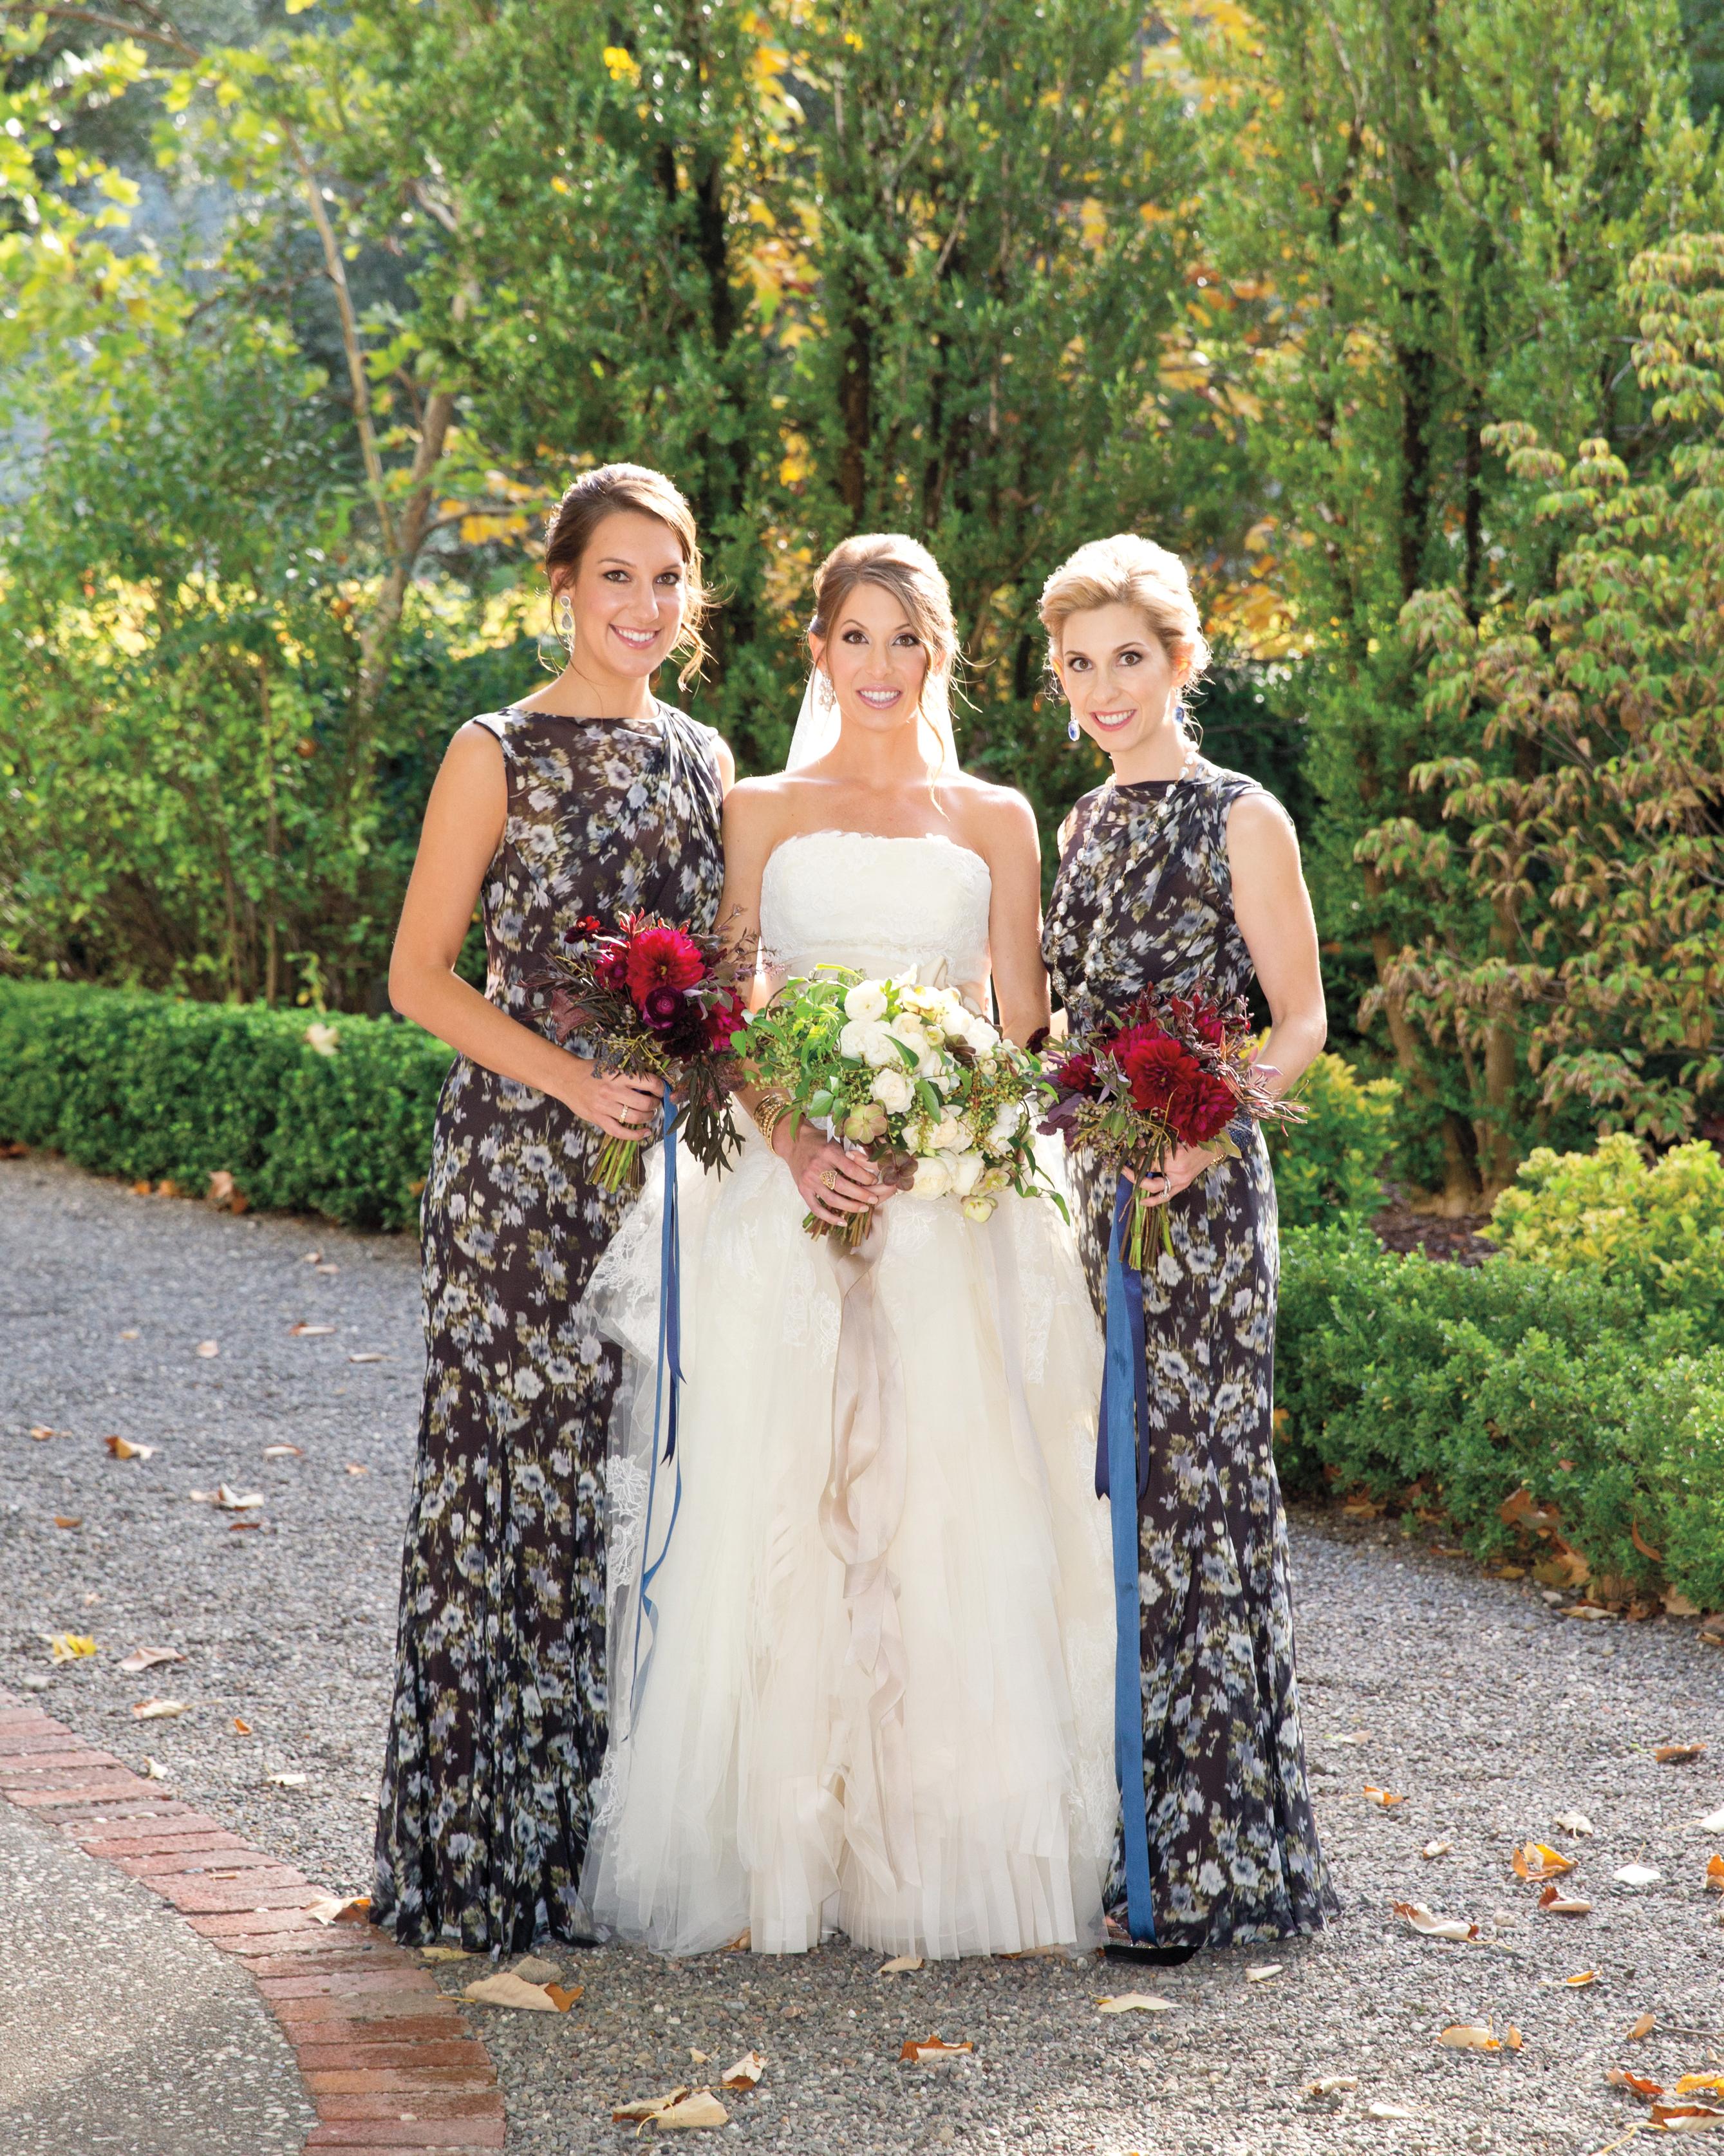 nicole-bradley-napa-california-wedding-0280-s112349.jpg